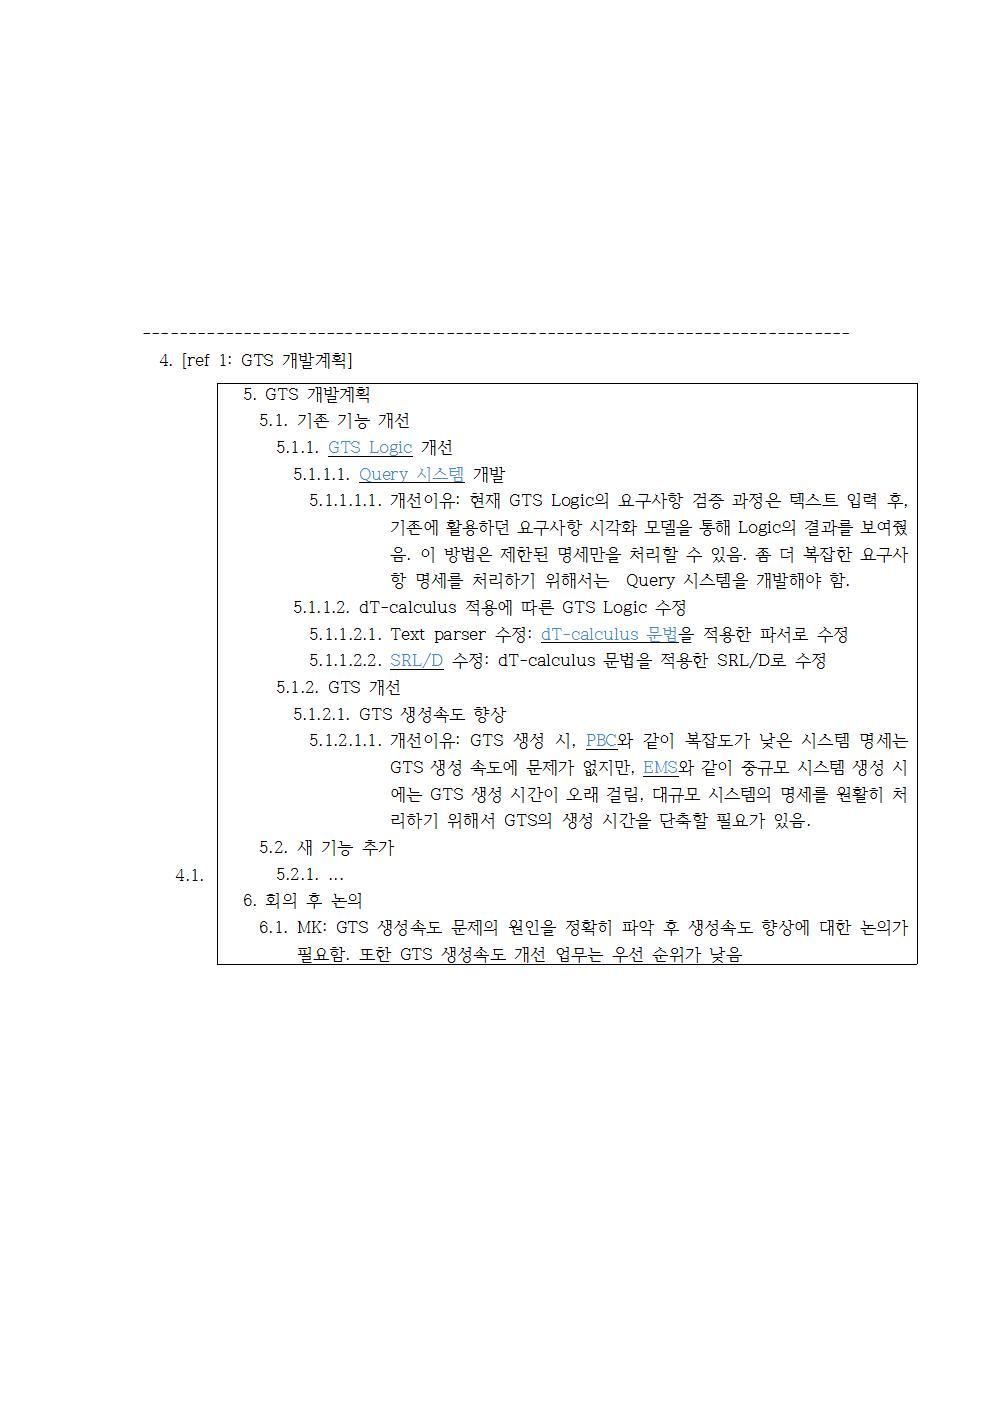 D-[17-005-RD-01]-[SAVE2.0-ADOxx]-[SH]-[2017-12-18]002.jpg